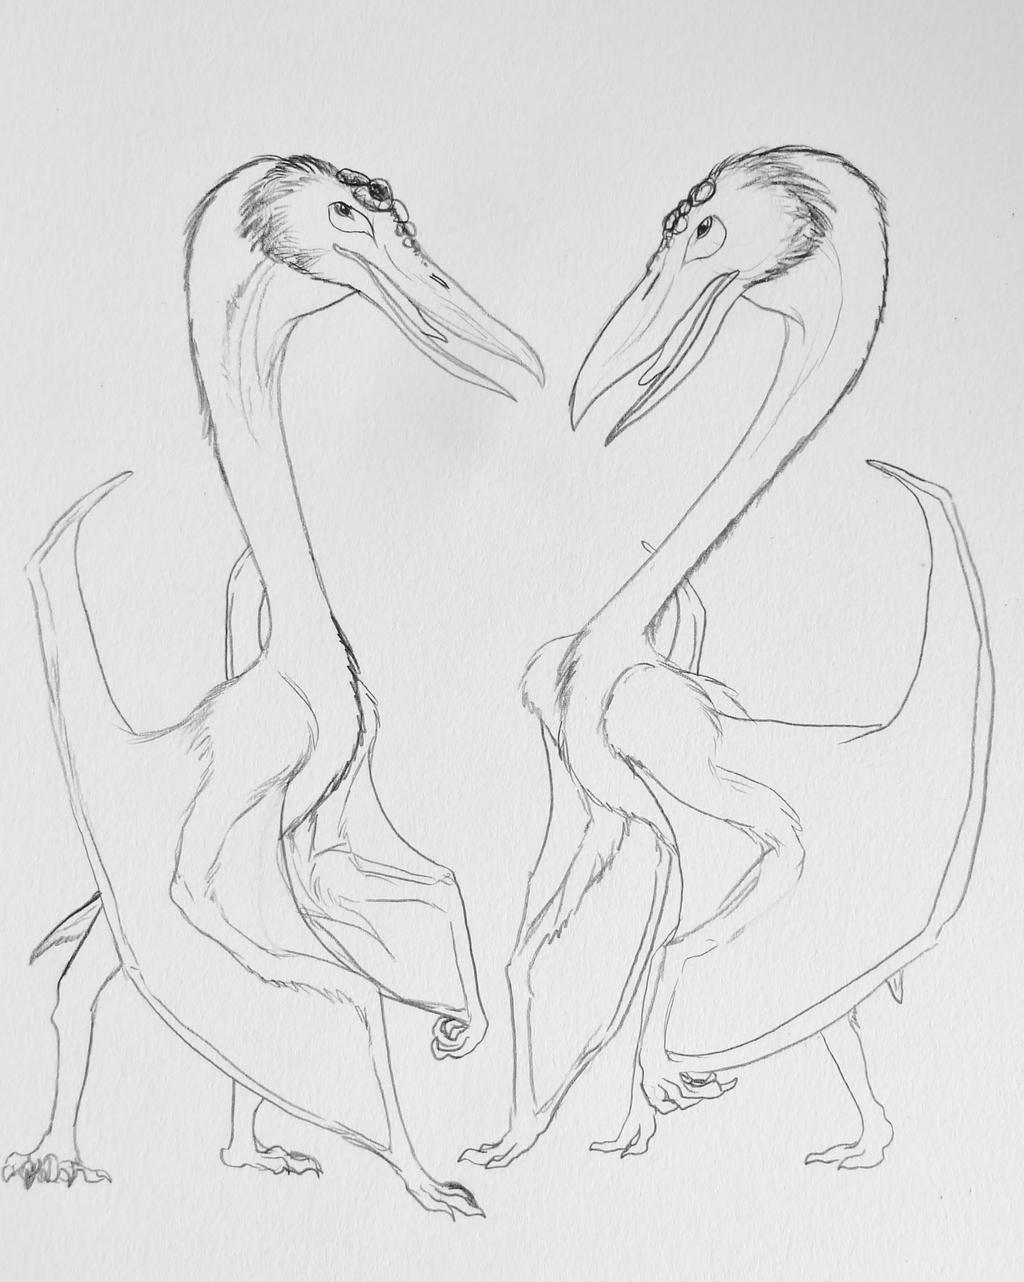 Azhdarchid Pair (sketch)